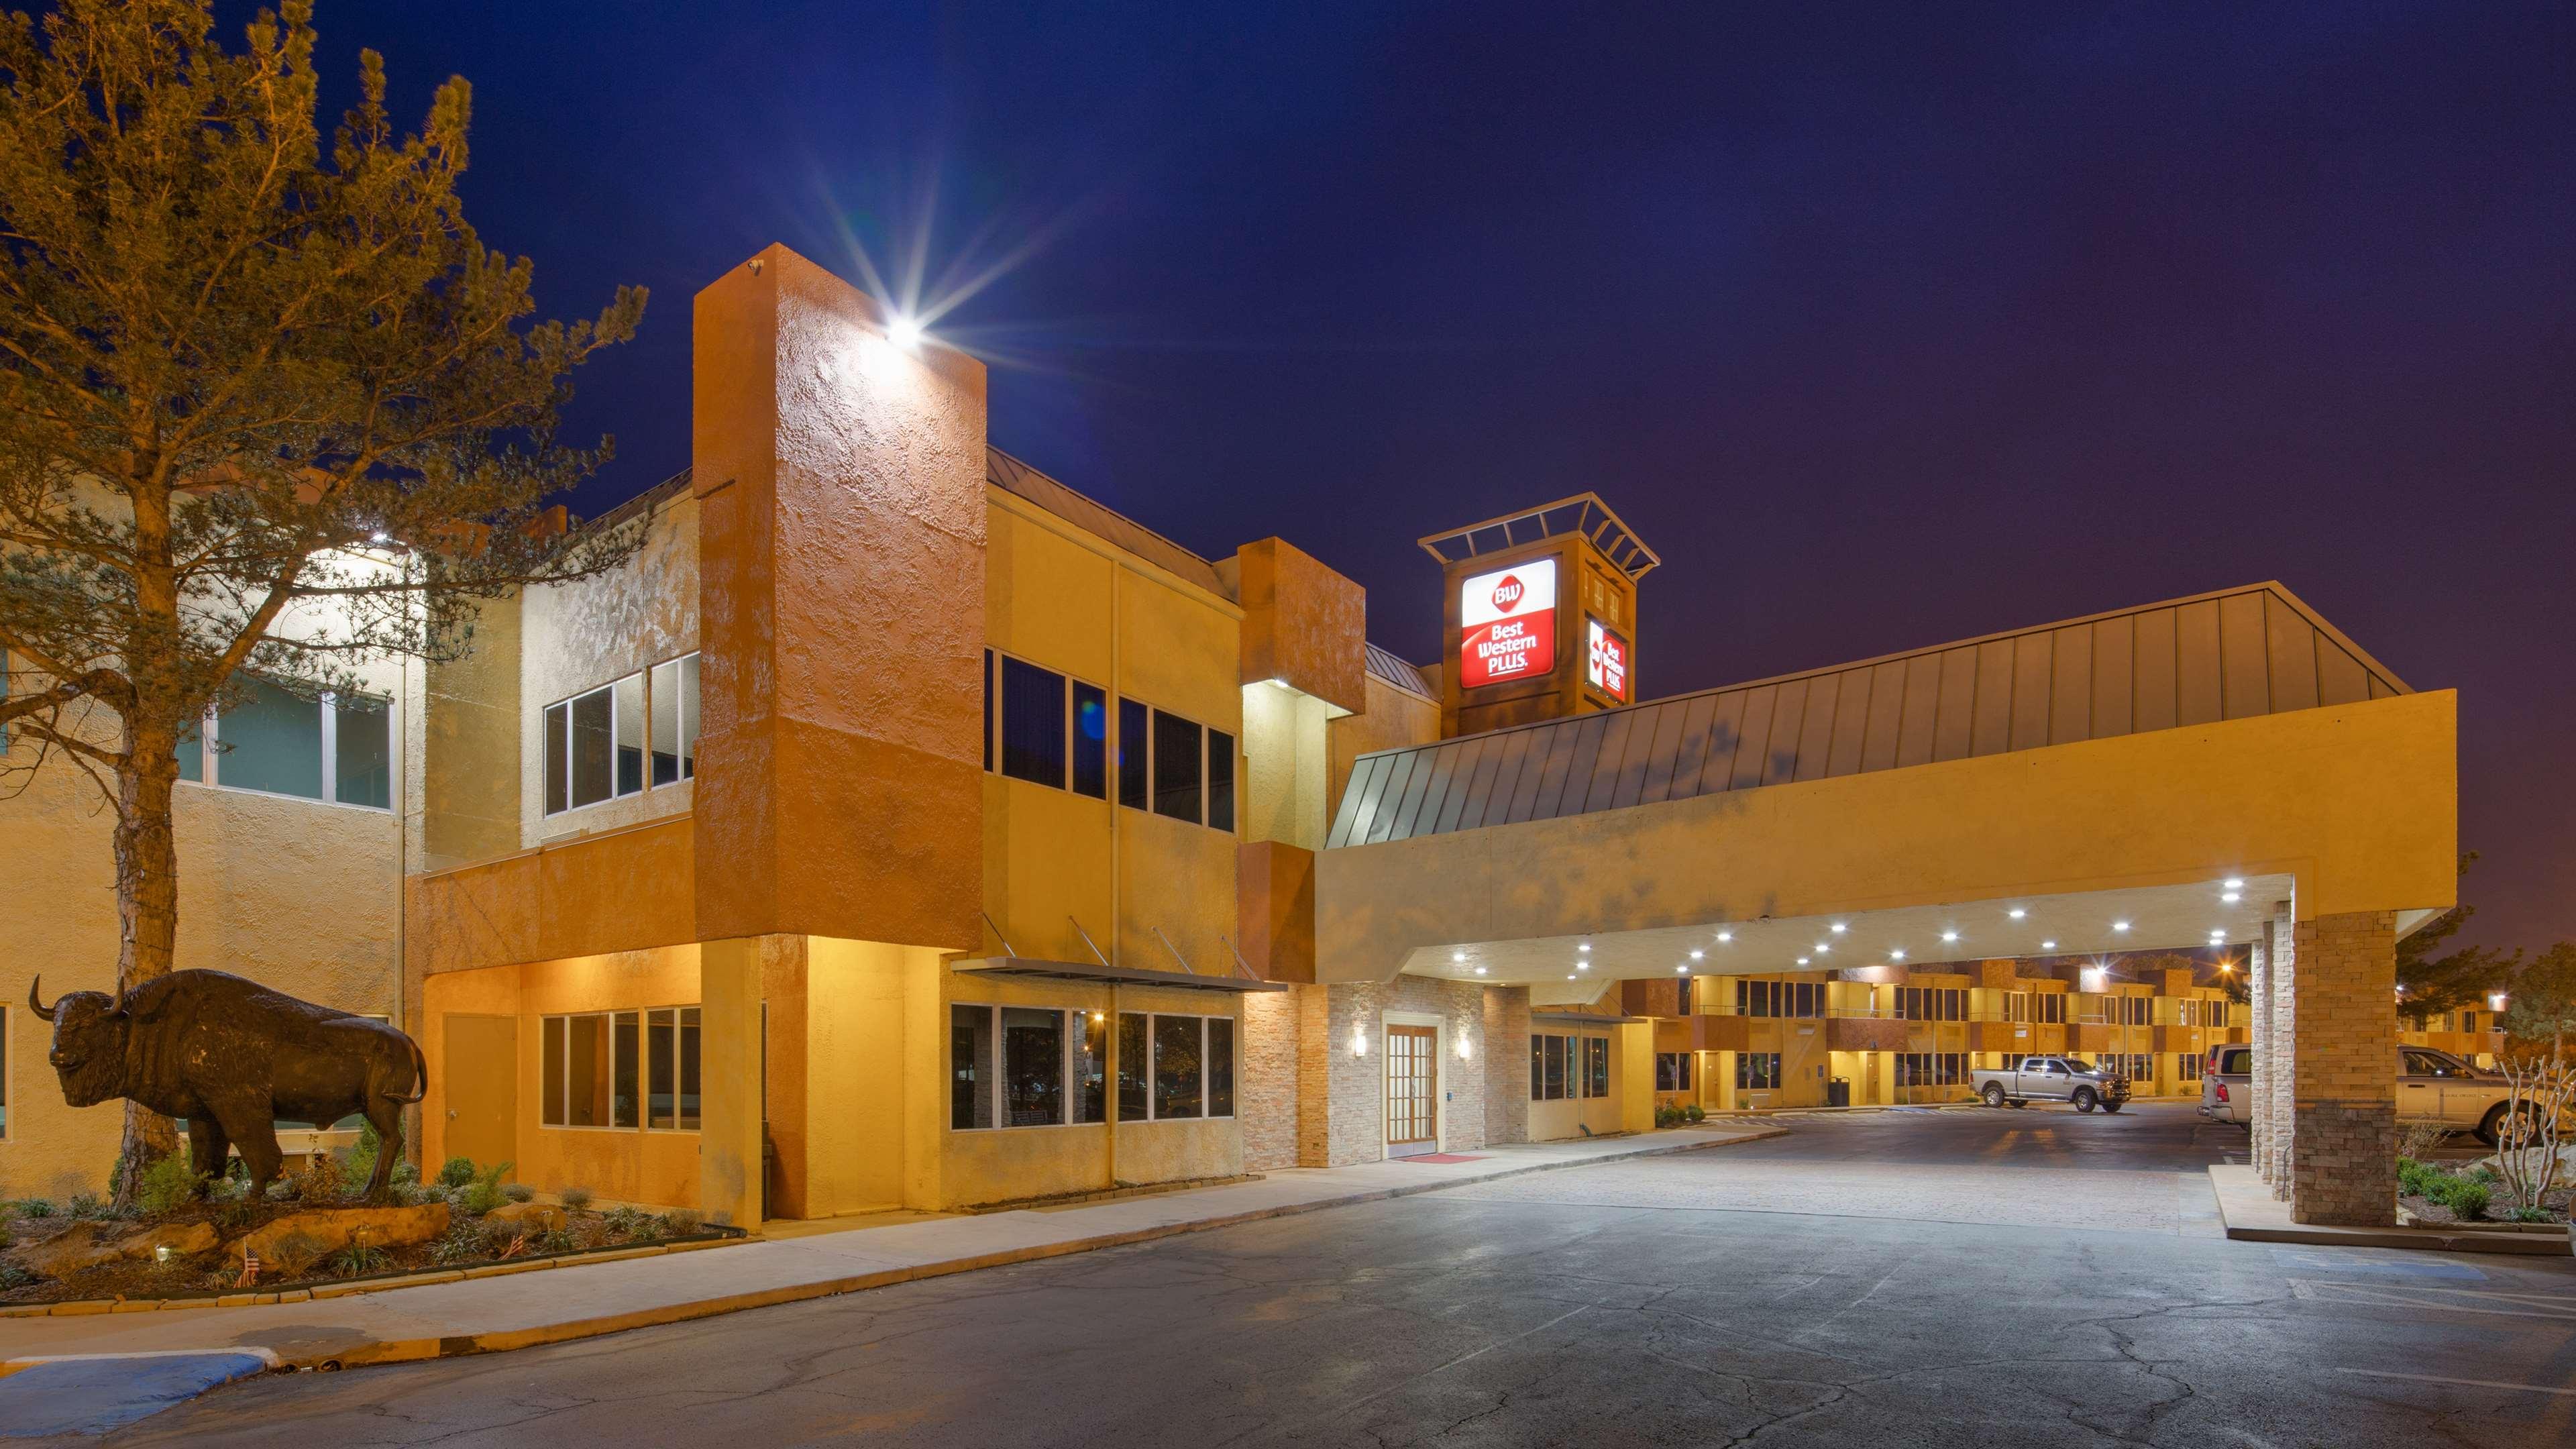 Best Western Plus Lawton Hotel & Convention Center image 0